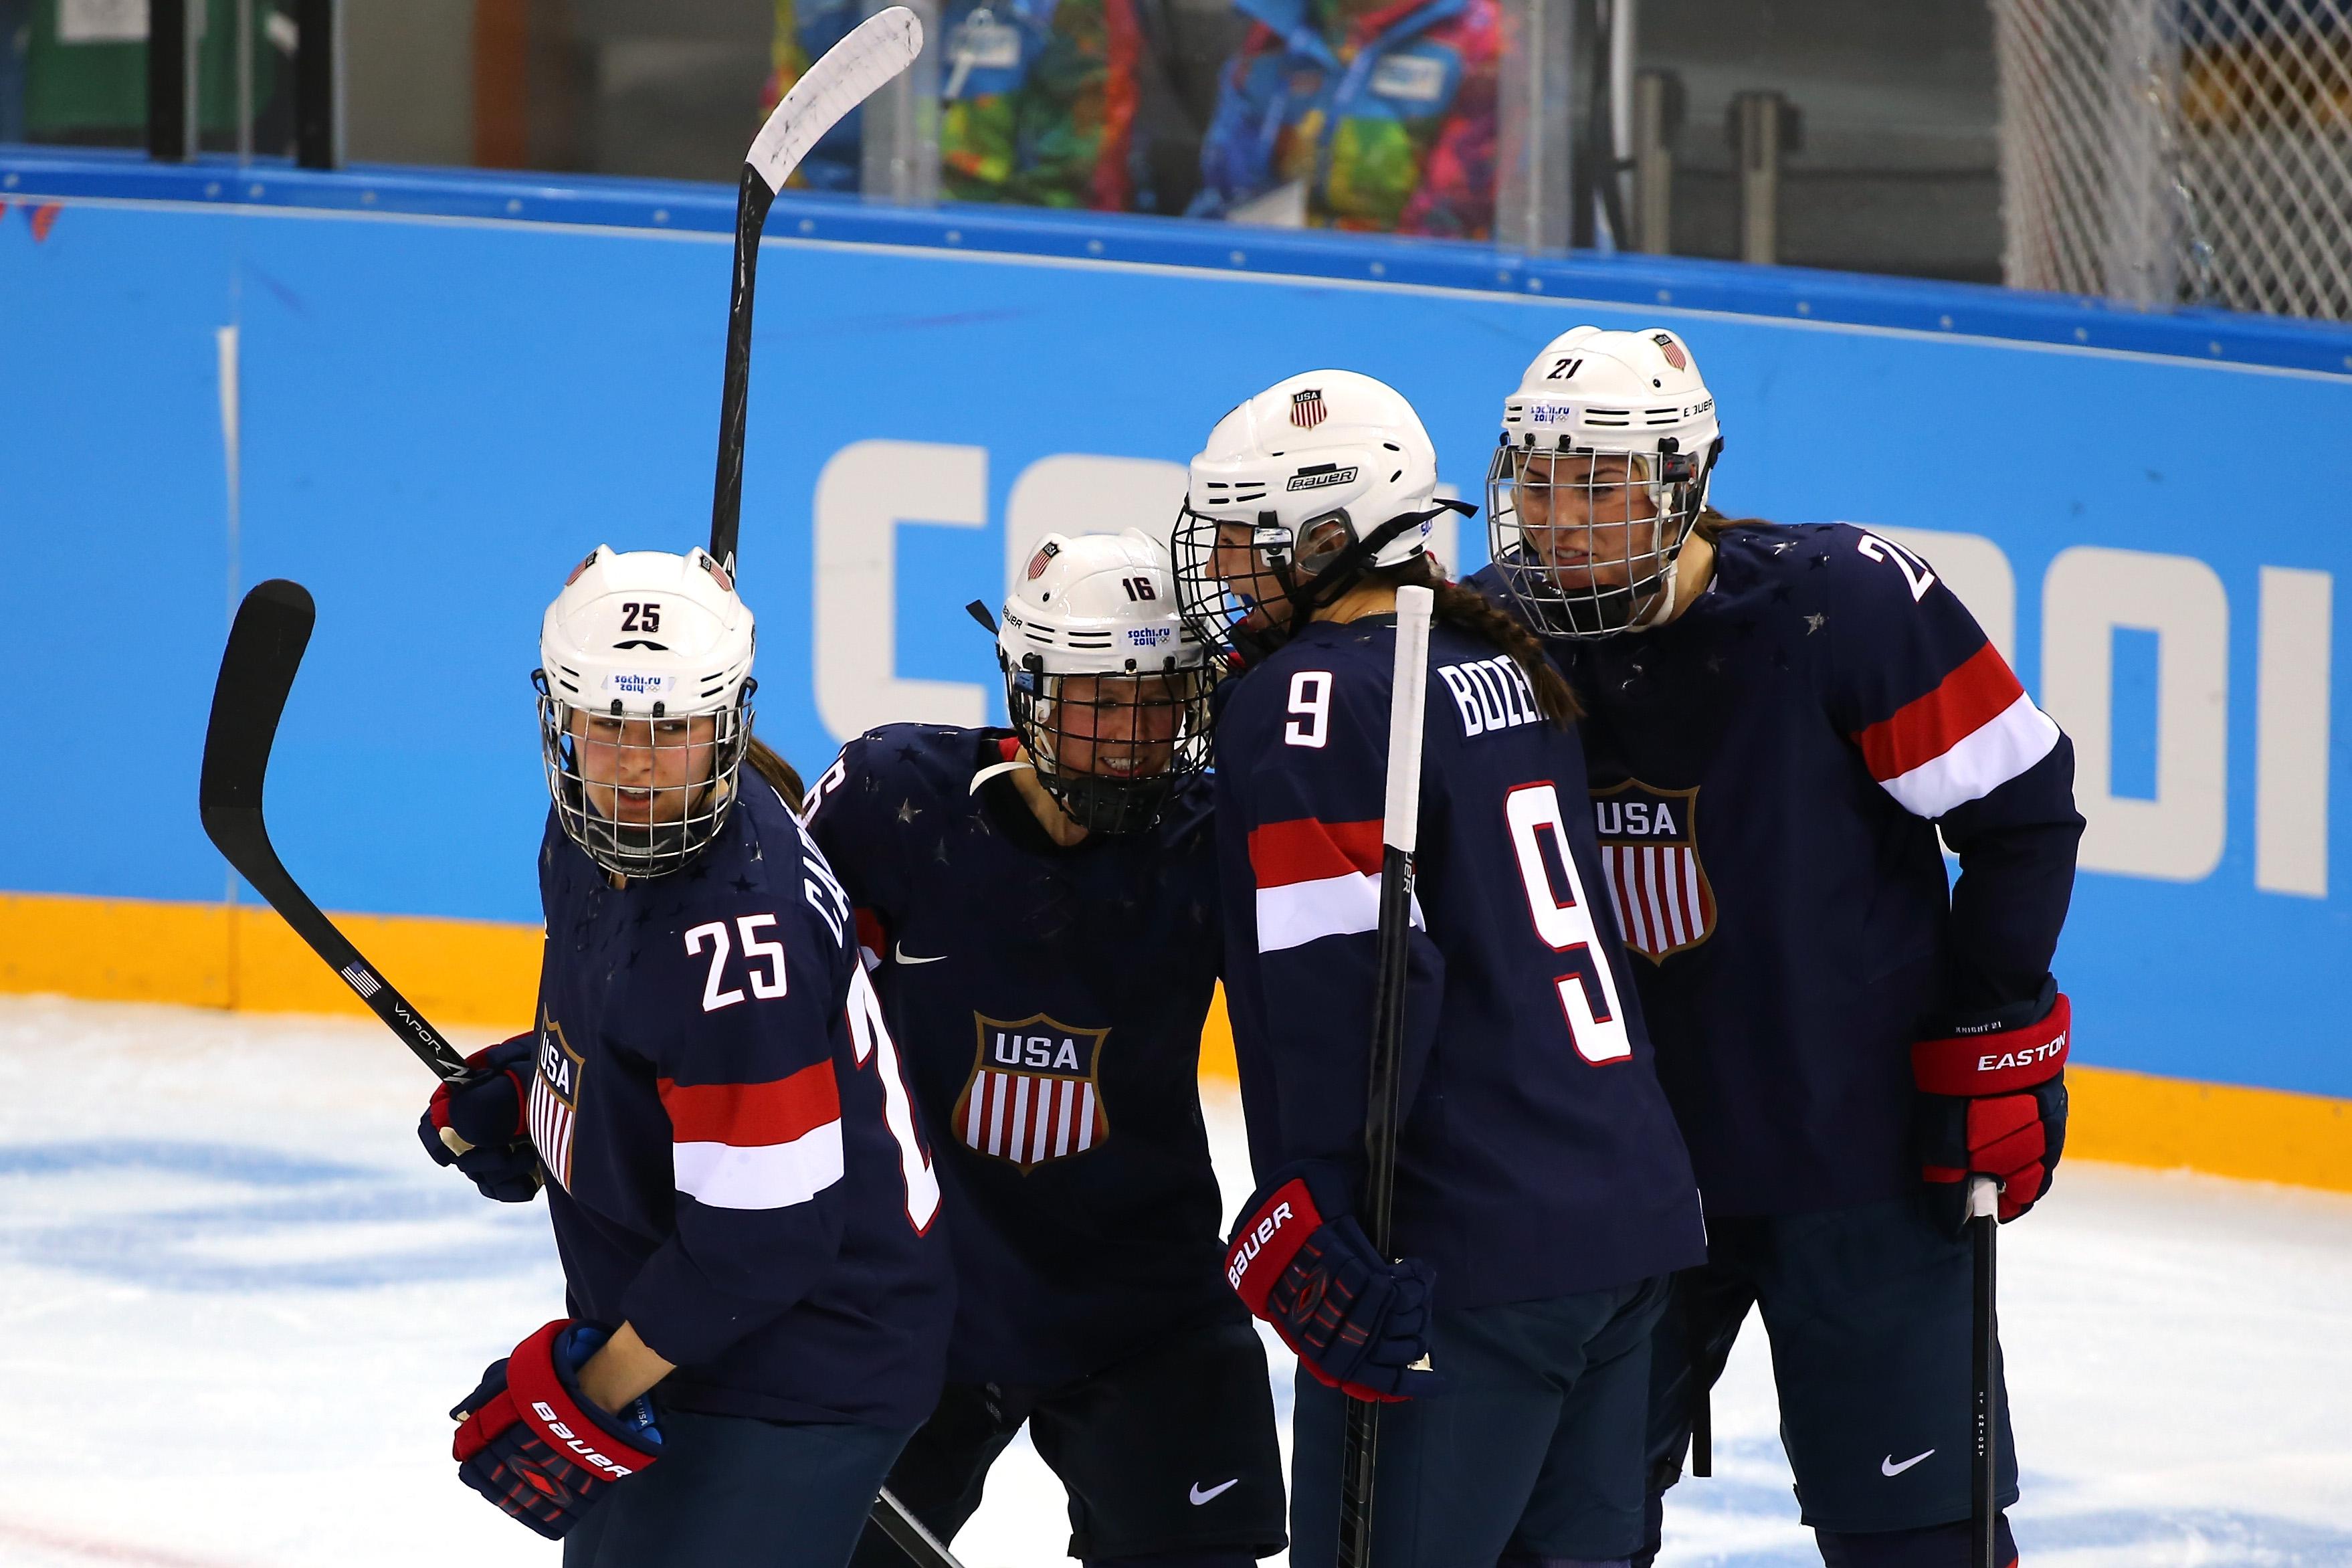 Women's Ice Hockey - United States vs Finland